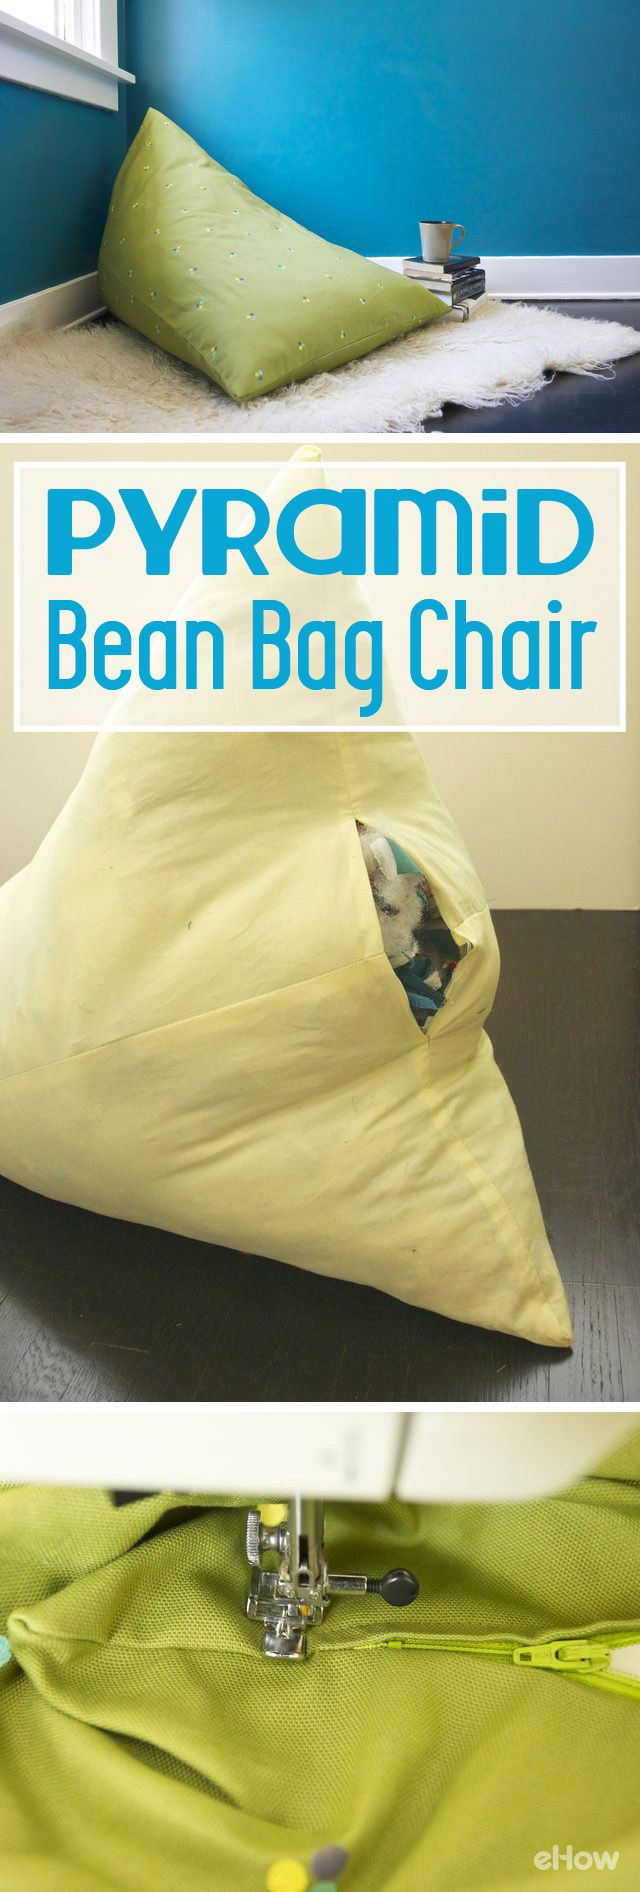 How to make bean bag chairs - How To Make A Pyramid Beanbag Chair